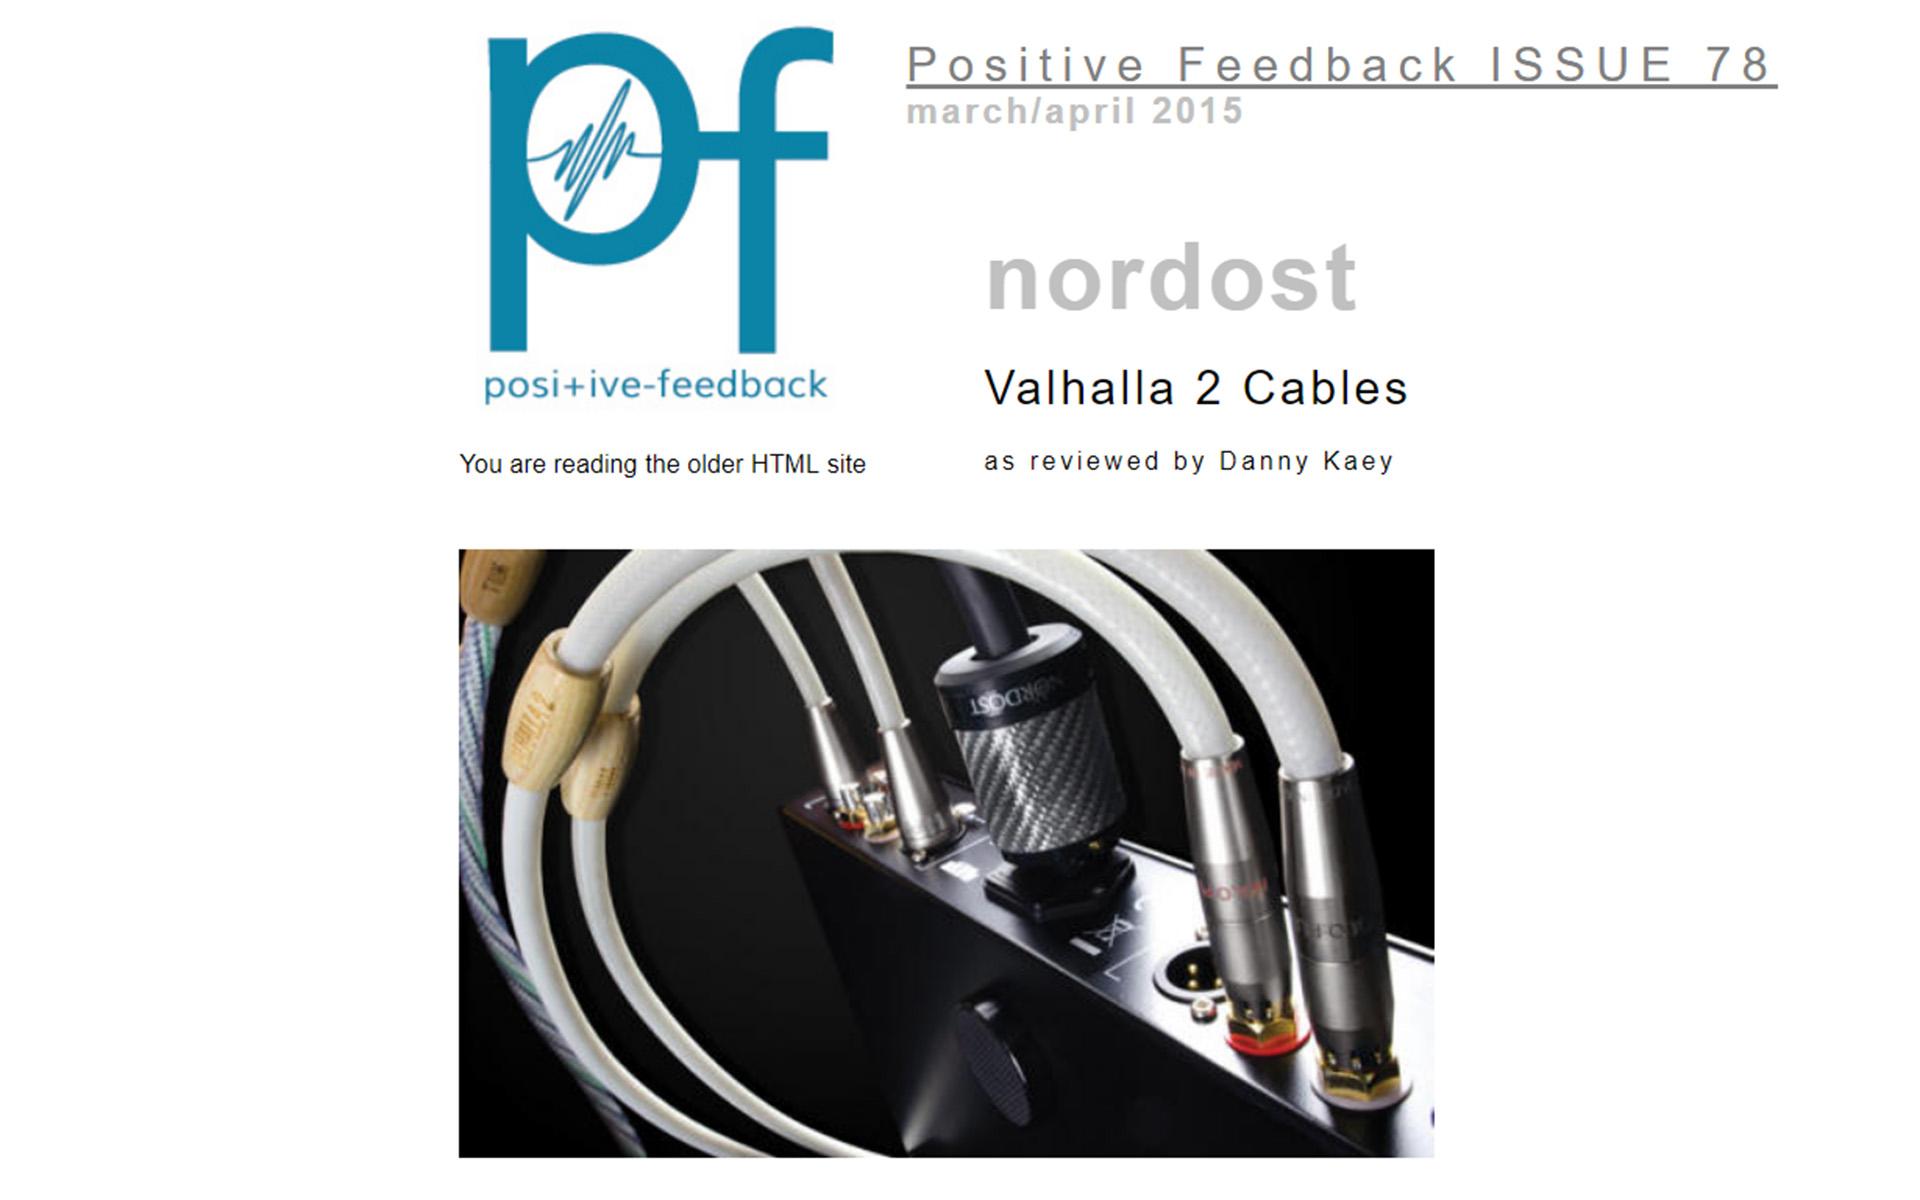 Nordost positive-feedback